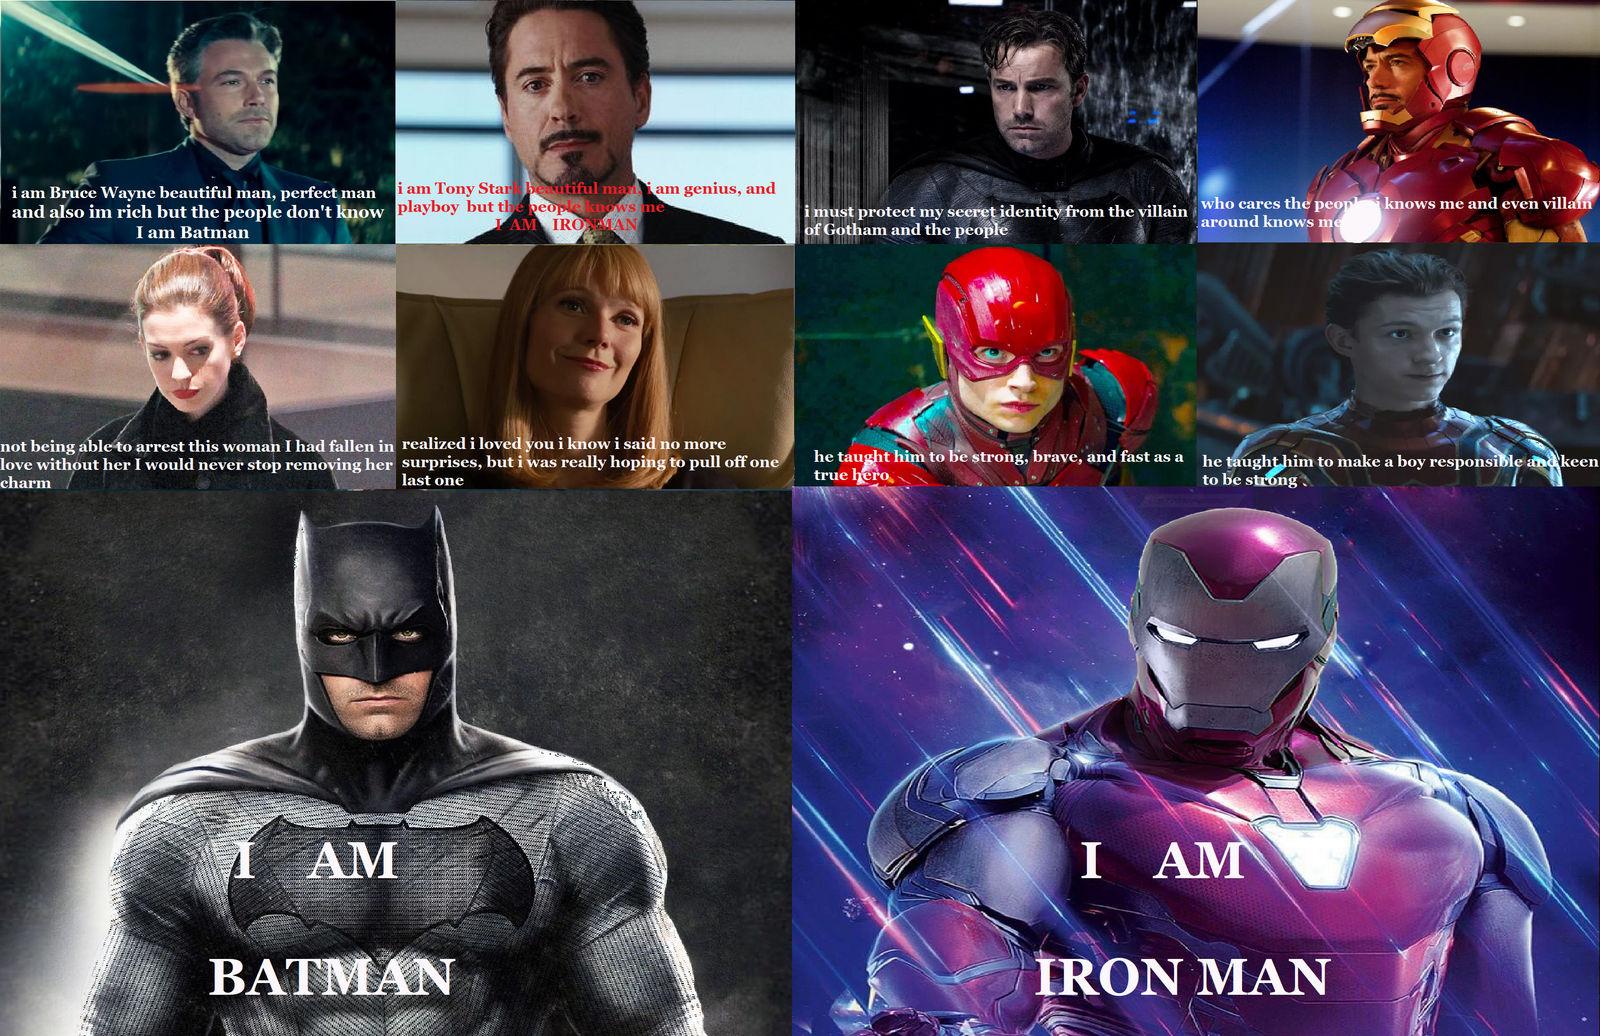 I AM BATMAN AND I AM IRON MAN by djpaint96 on DeviantArt